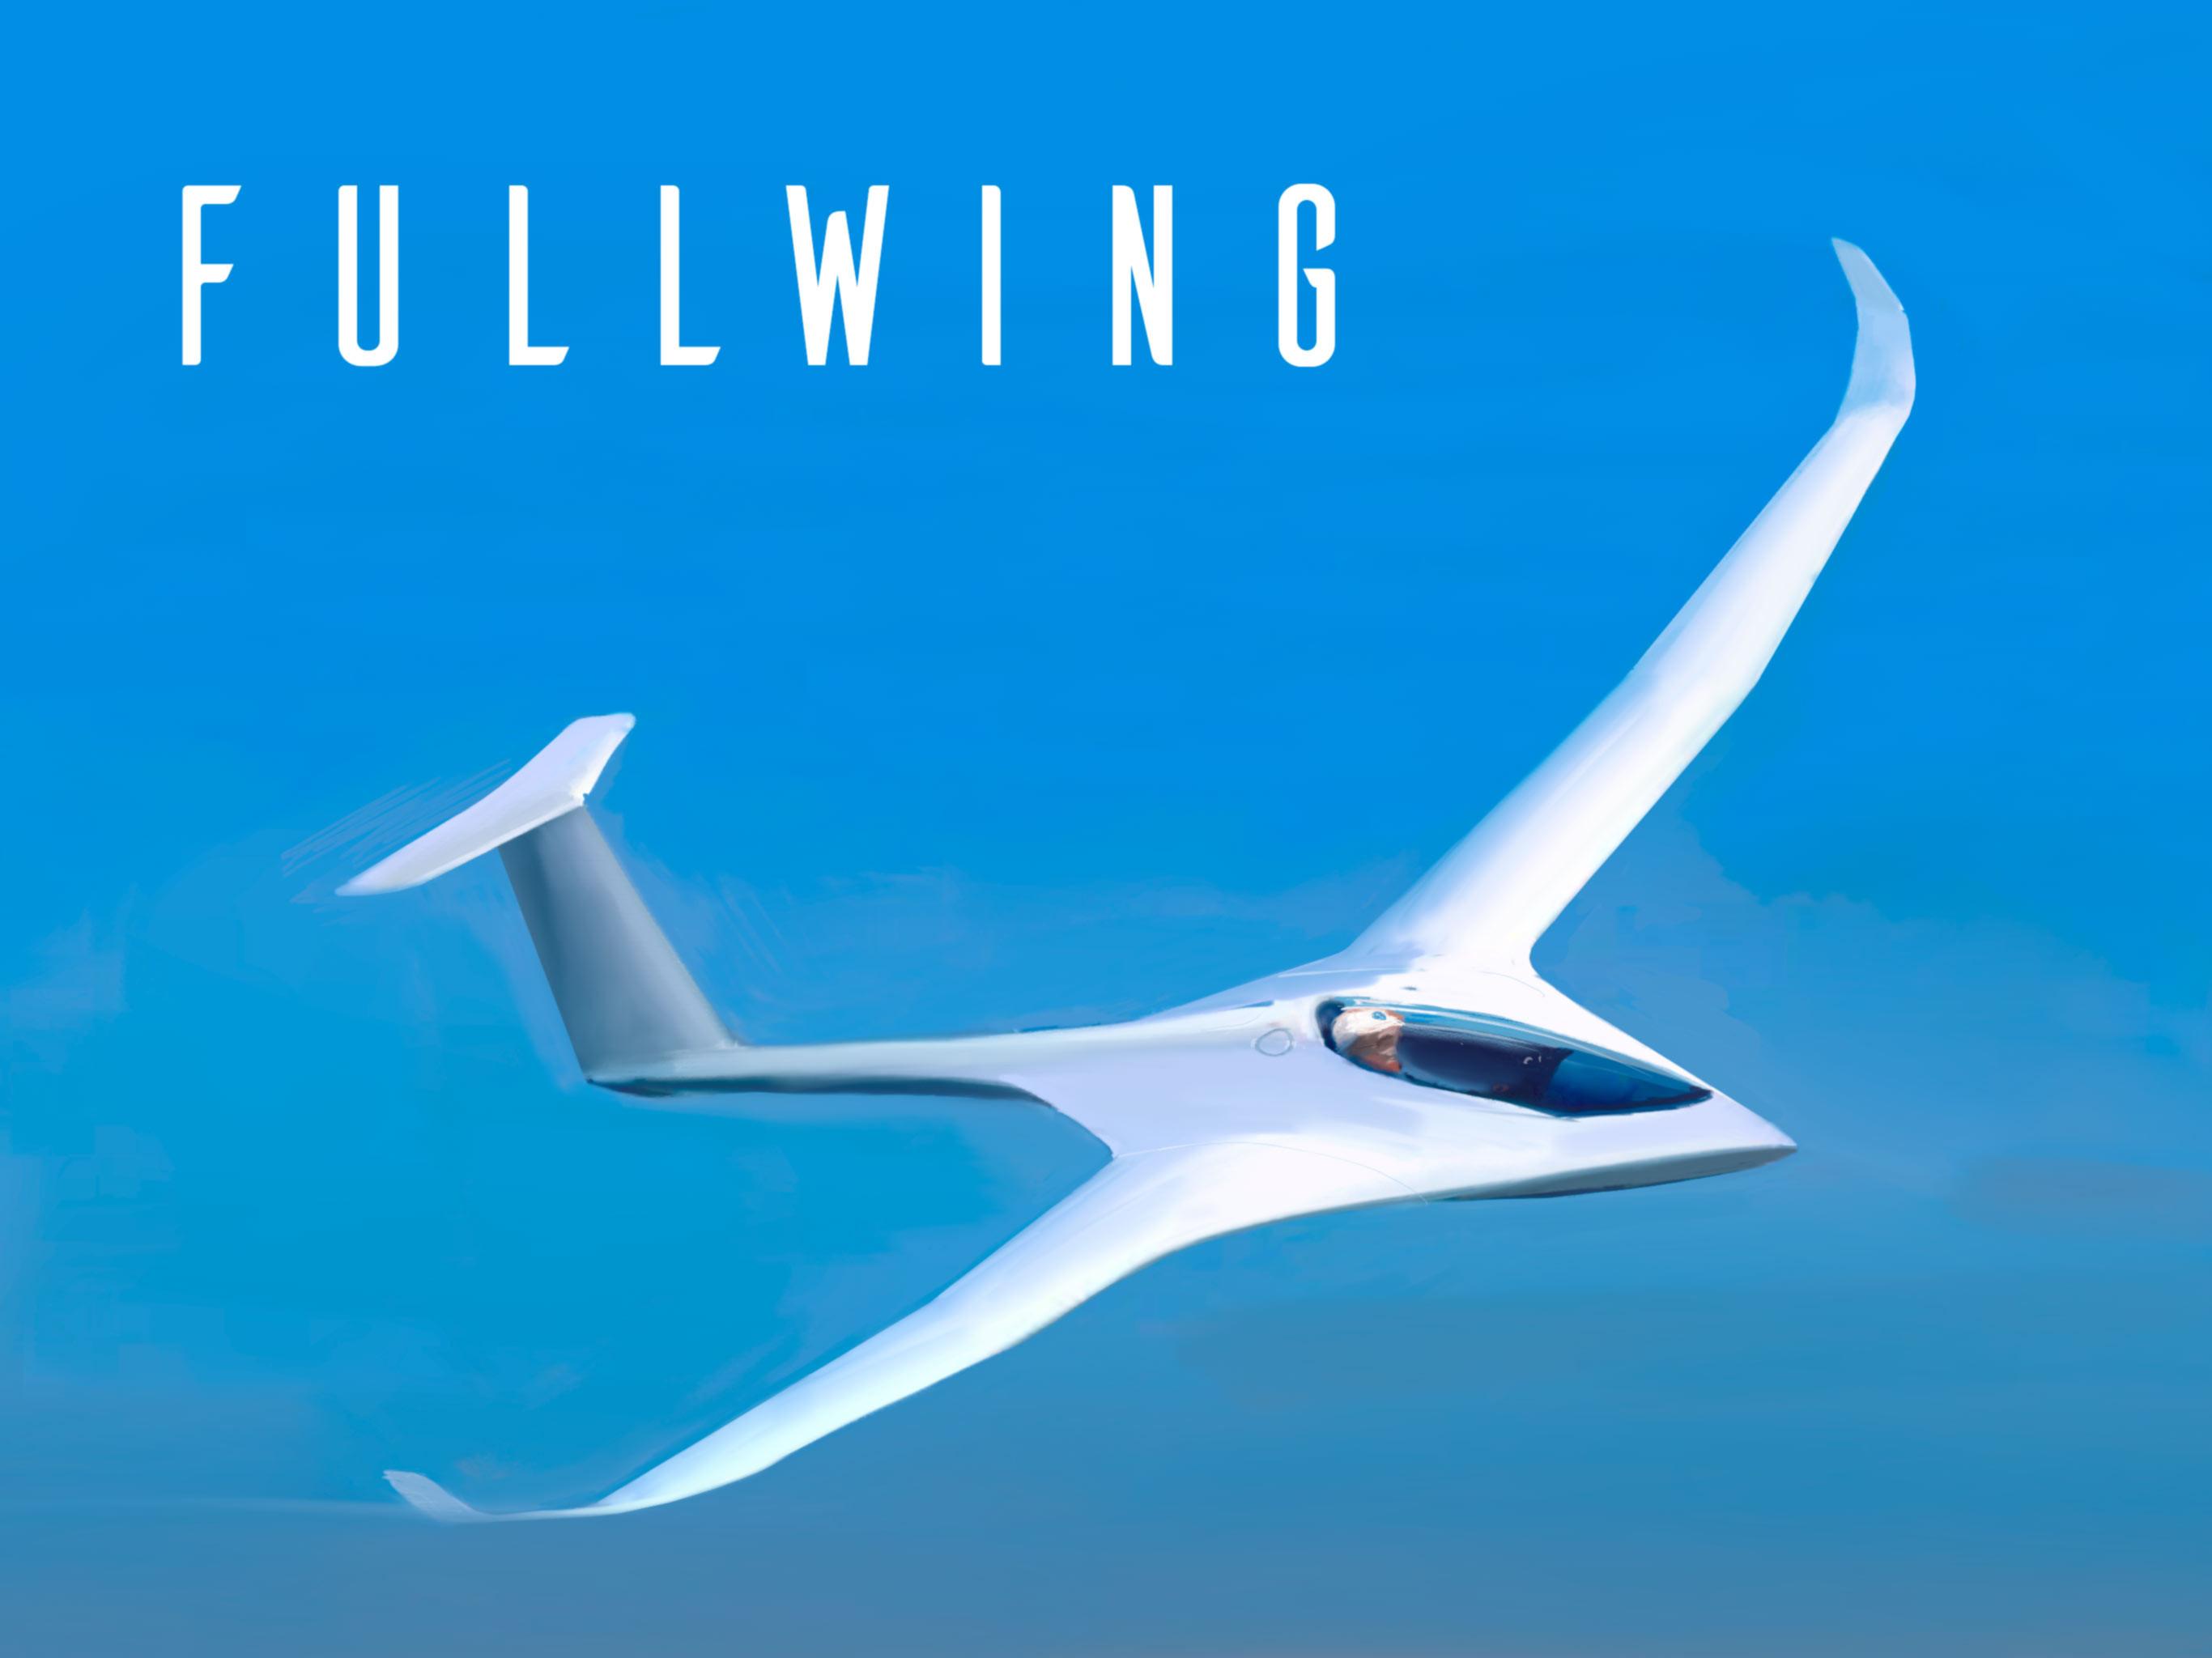 Fullwing Sailplane Glider concept  sketch by Alan Mattanó SoaringStarsLab  2018